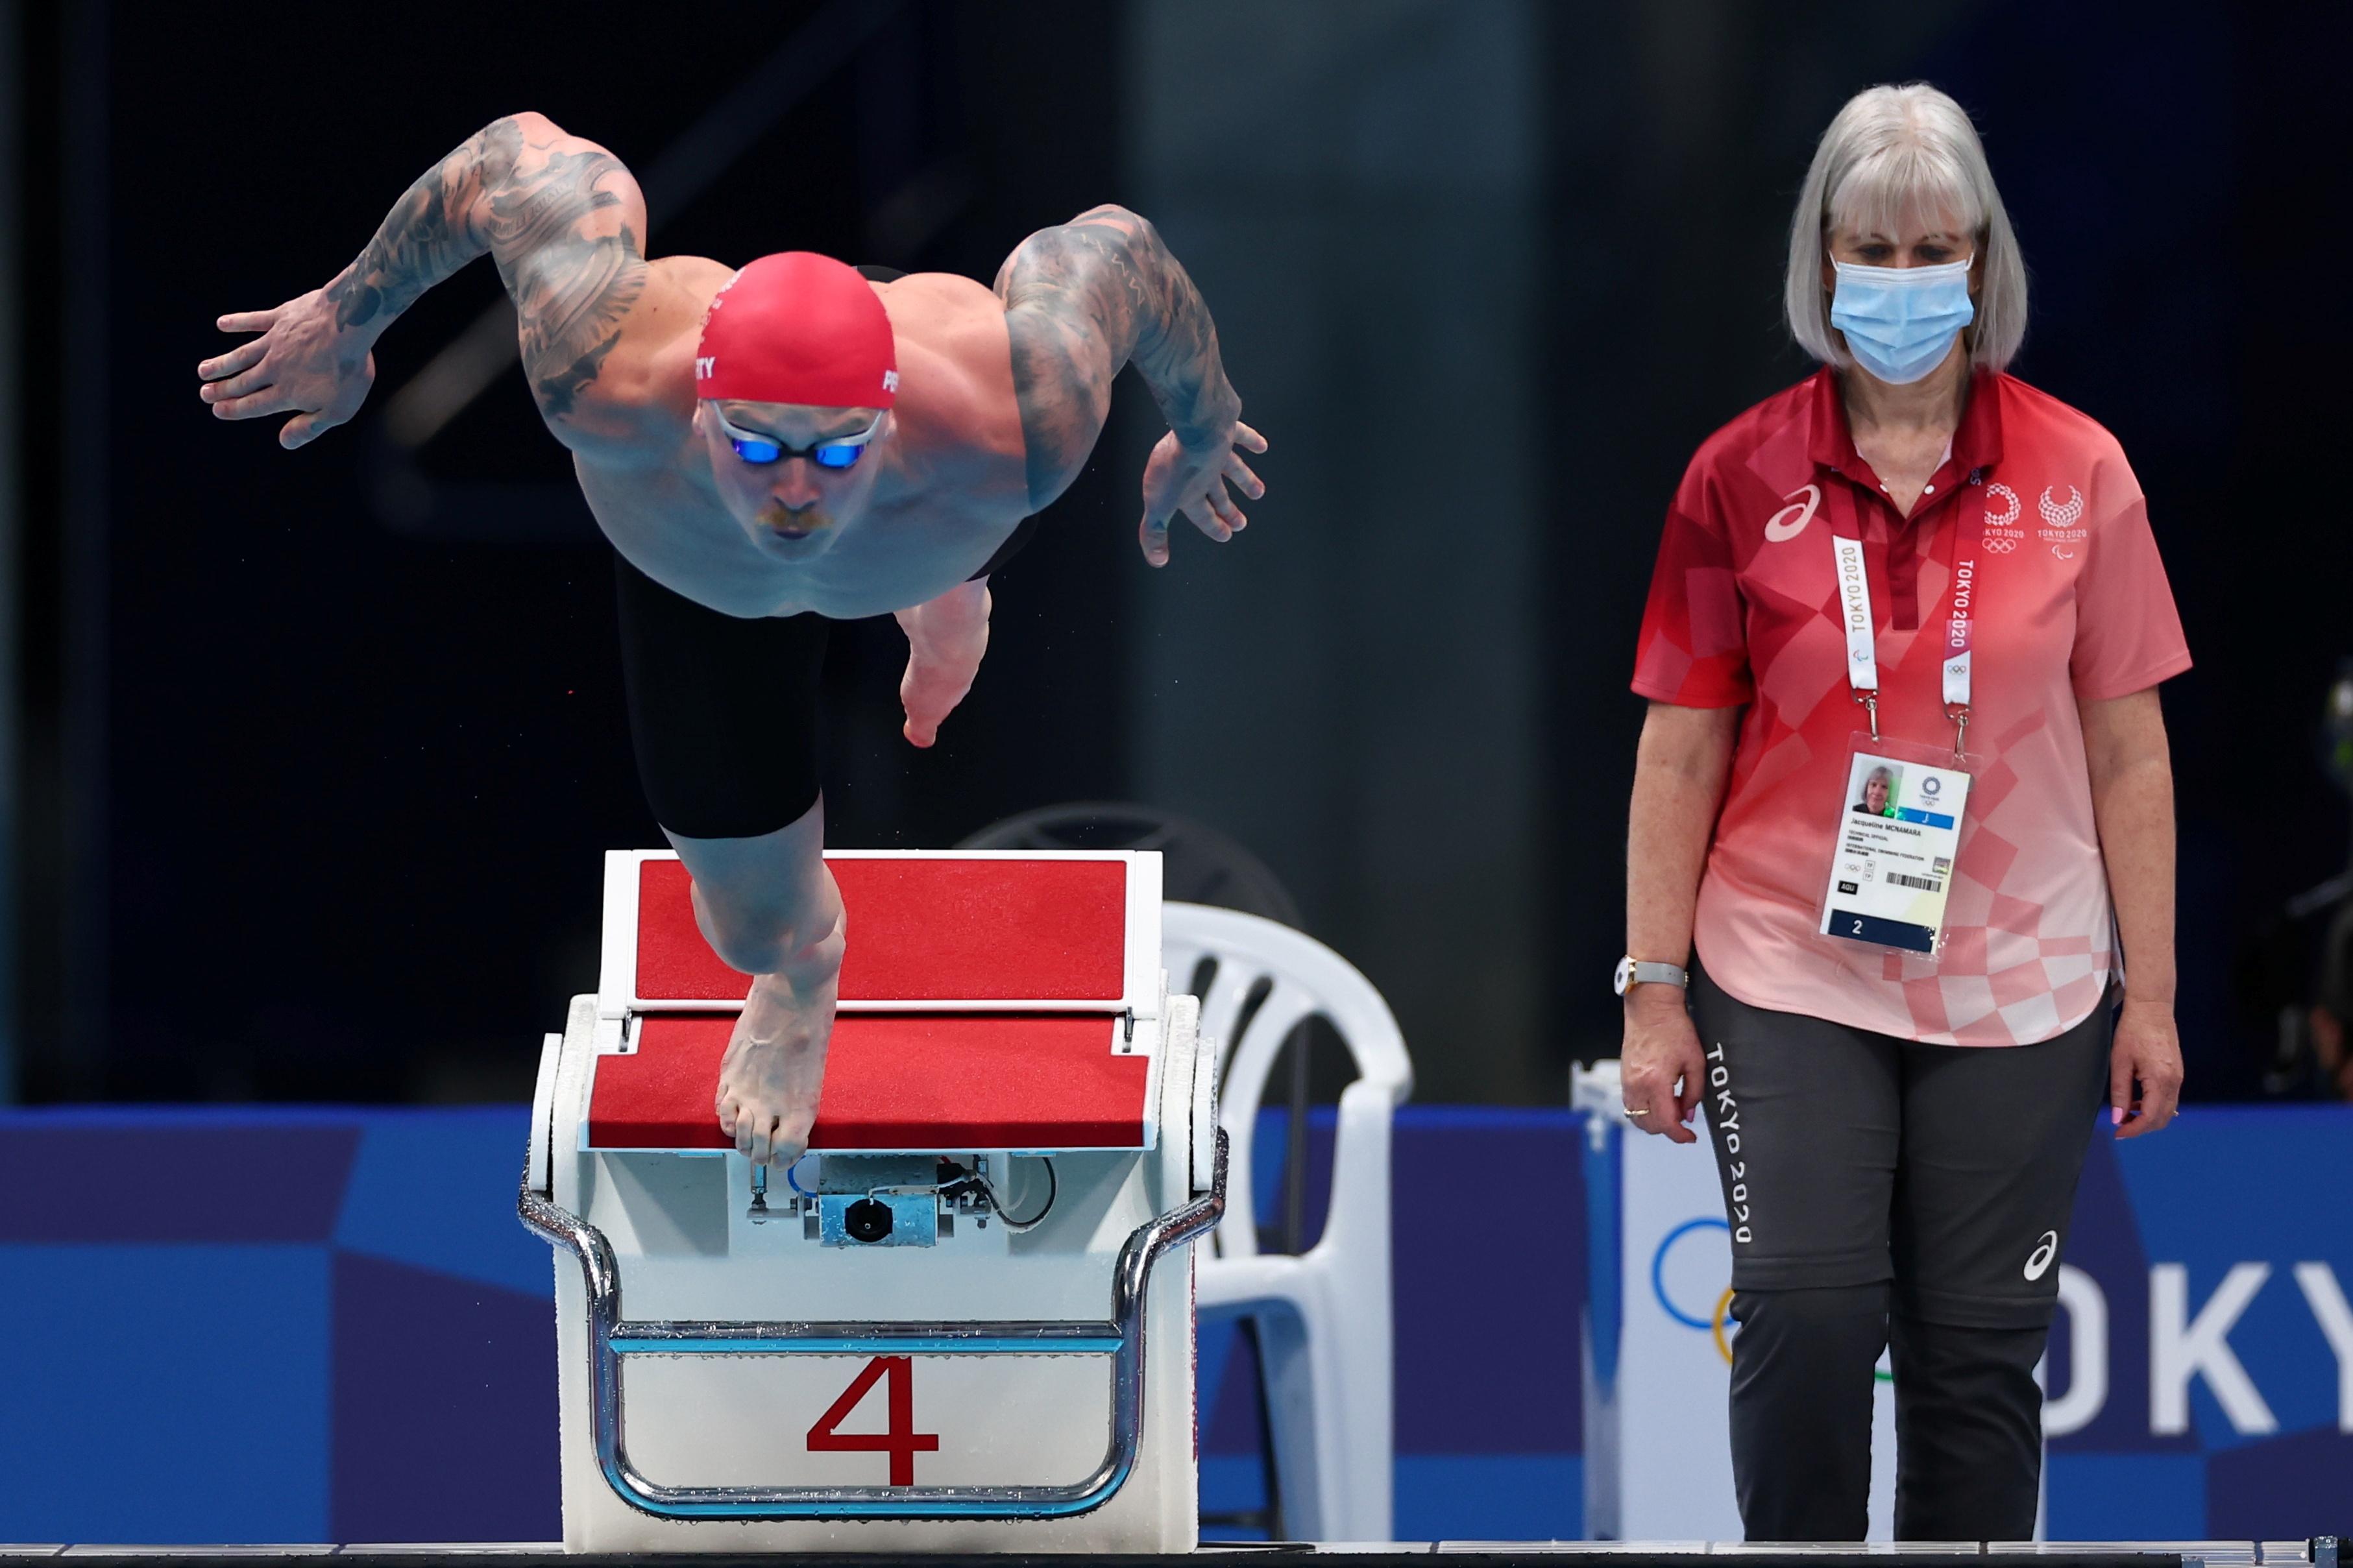 Tokyo 2020 Olympics - Swimming - Men's 100m Breaststroke - Heats - Tokyo Aquatics Centre - Tokyo, Japan - July 24, 2021. Adam Peaty of Britain in action as a referee wearing a mask looks on REUTERS/Kai Pfaffenbach